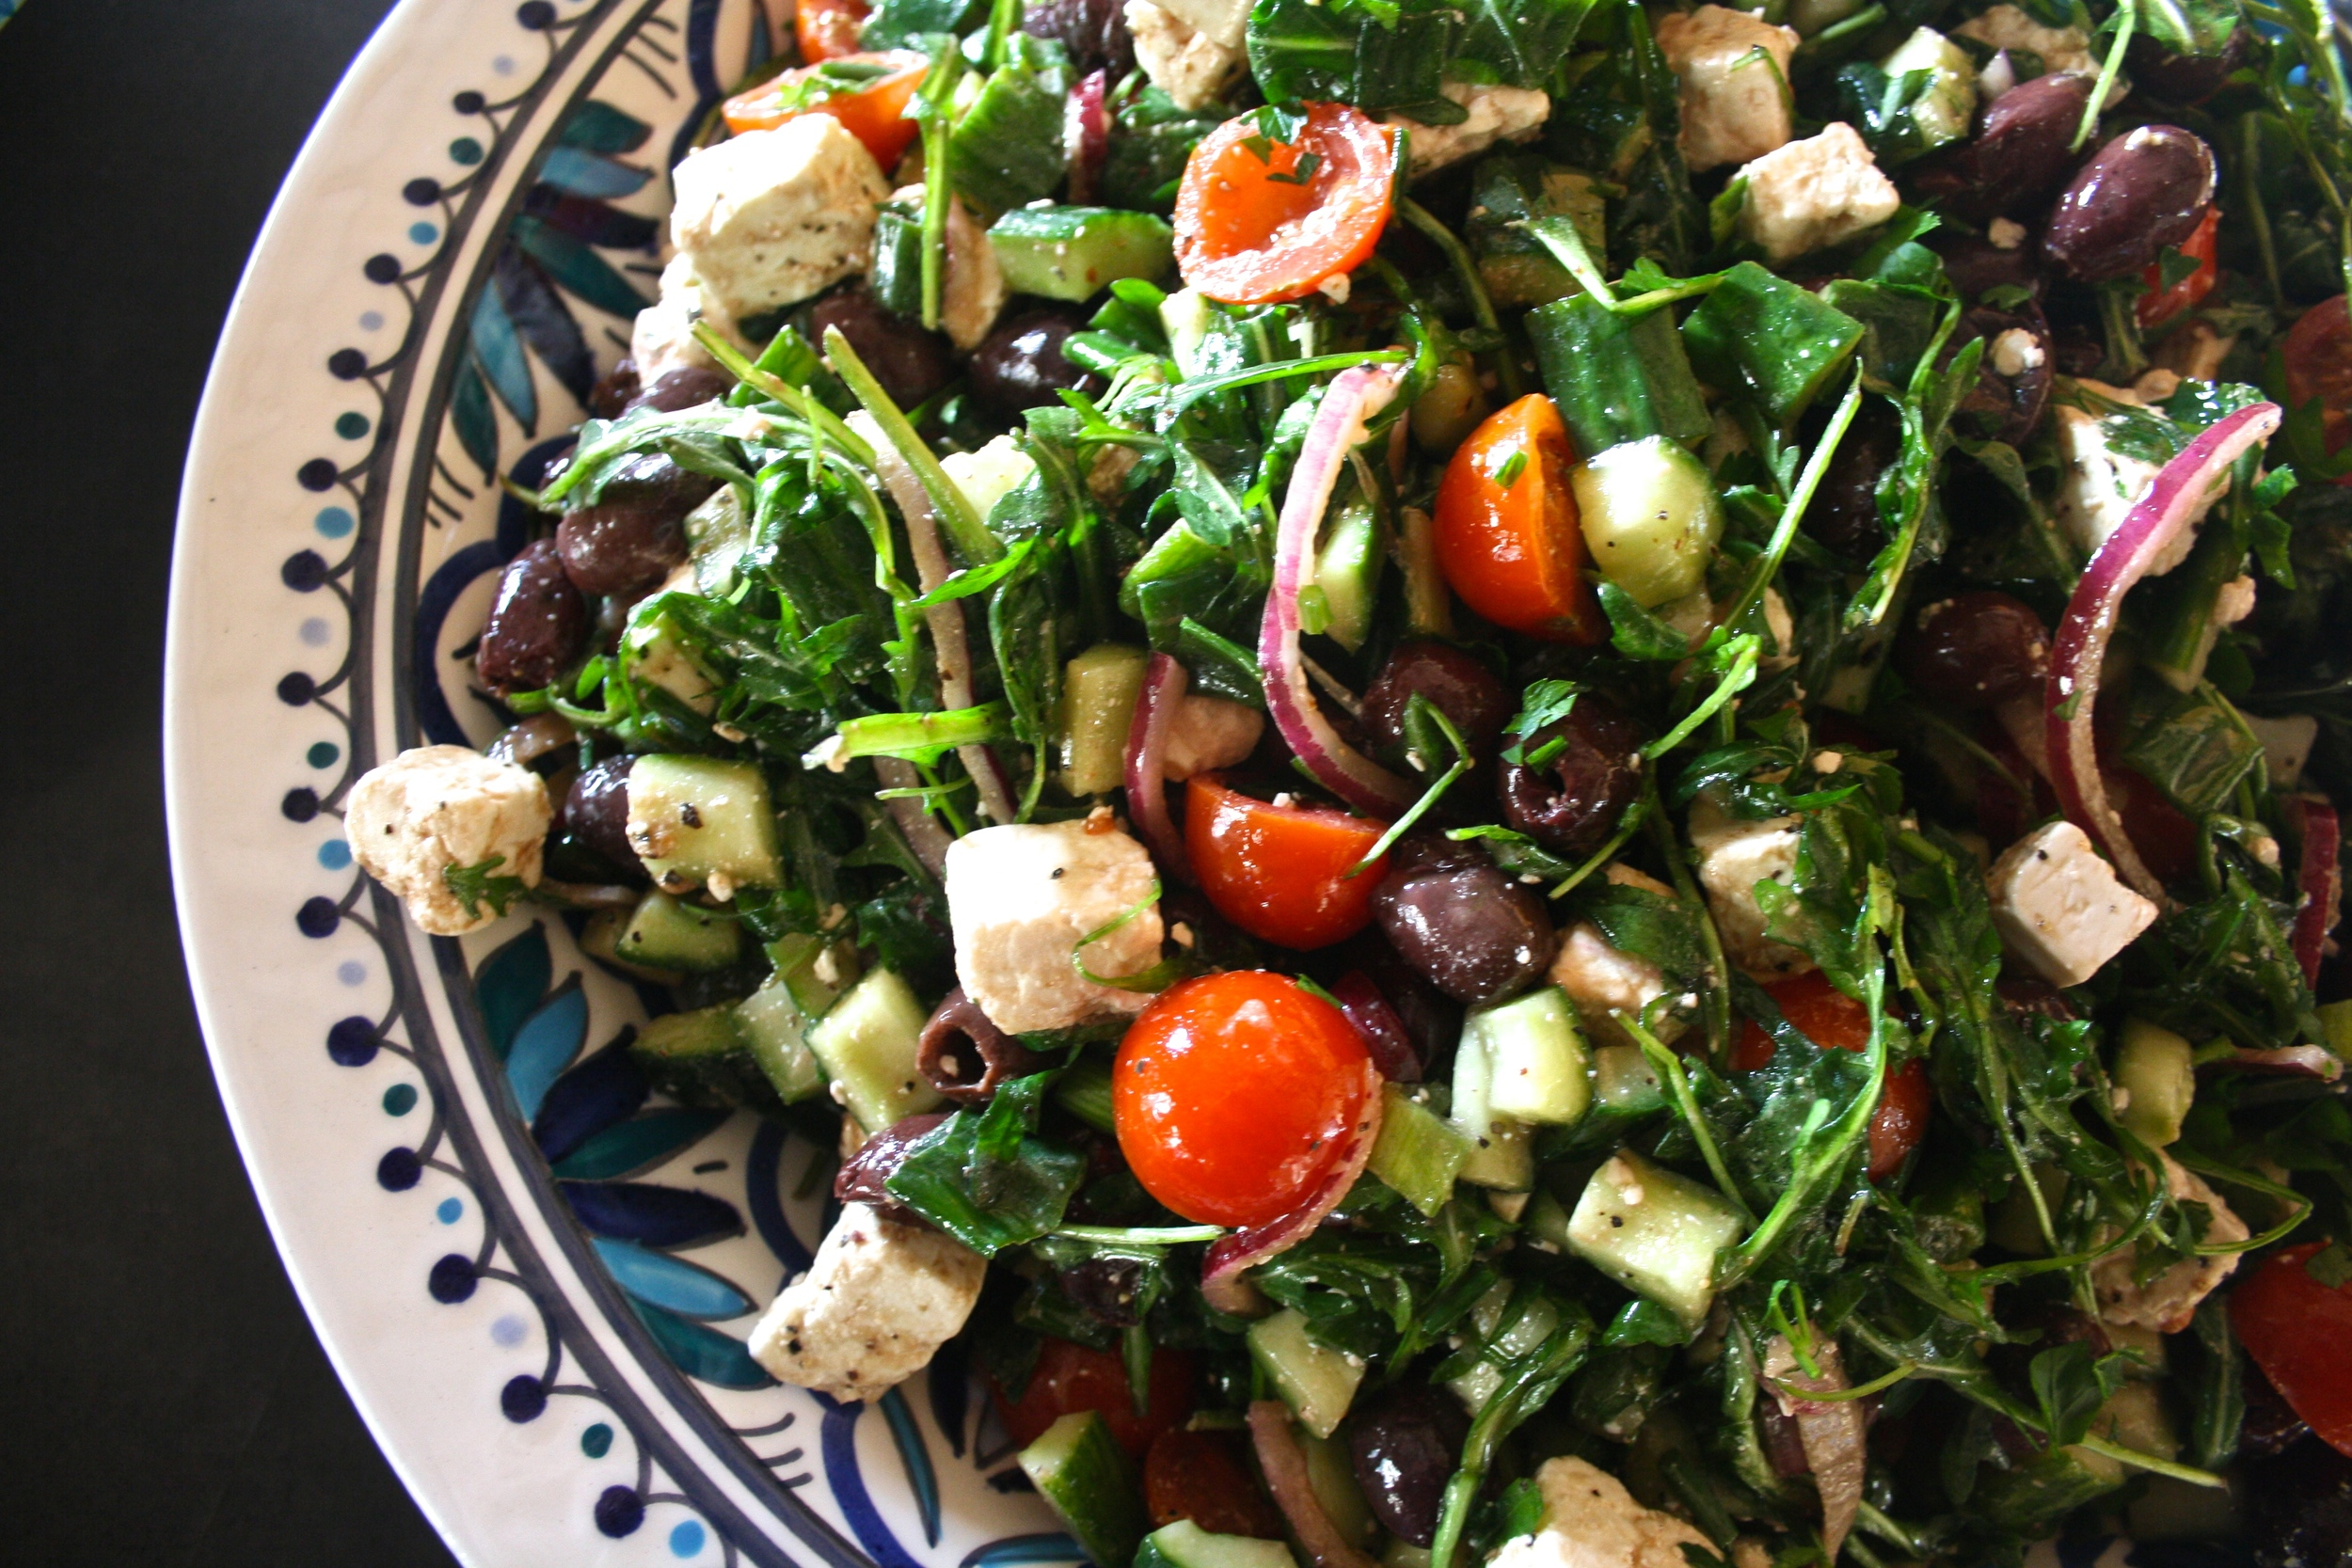 Large salad selection